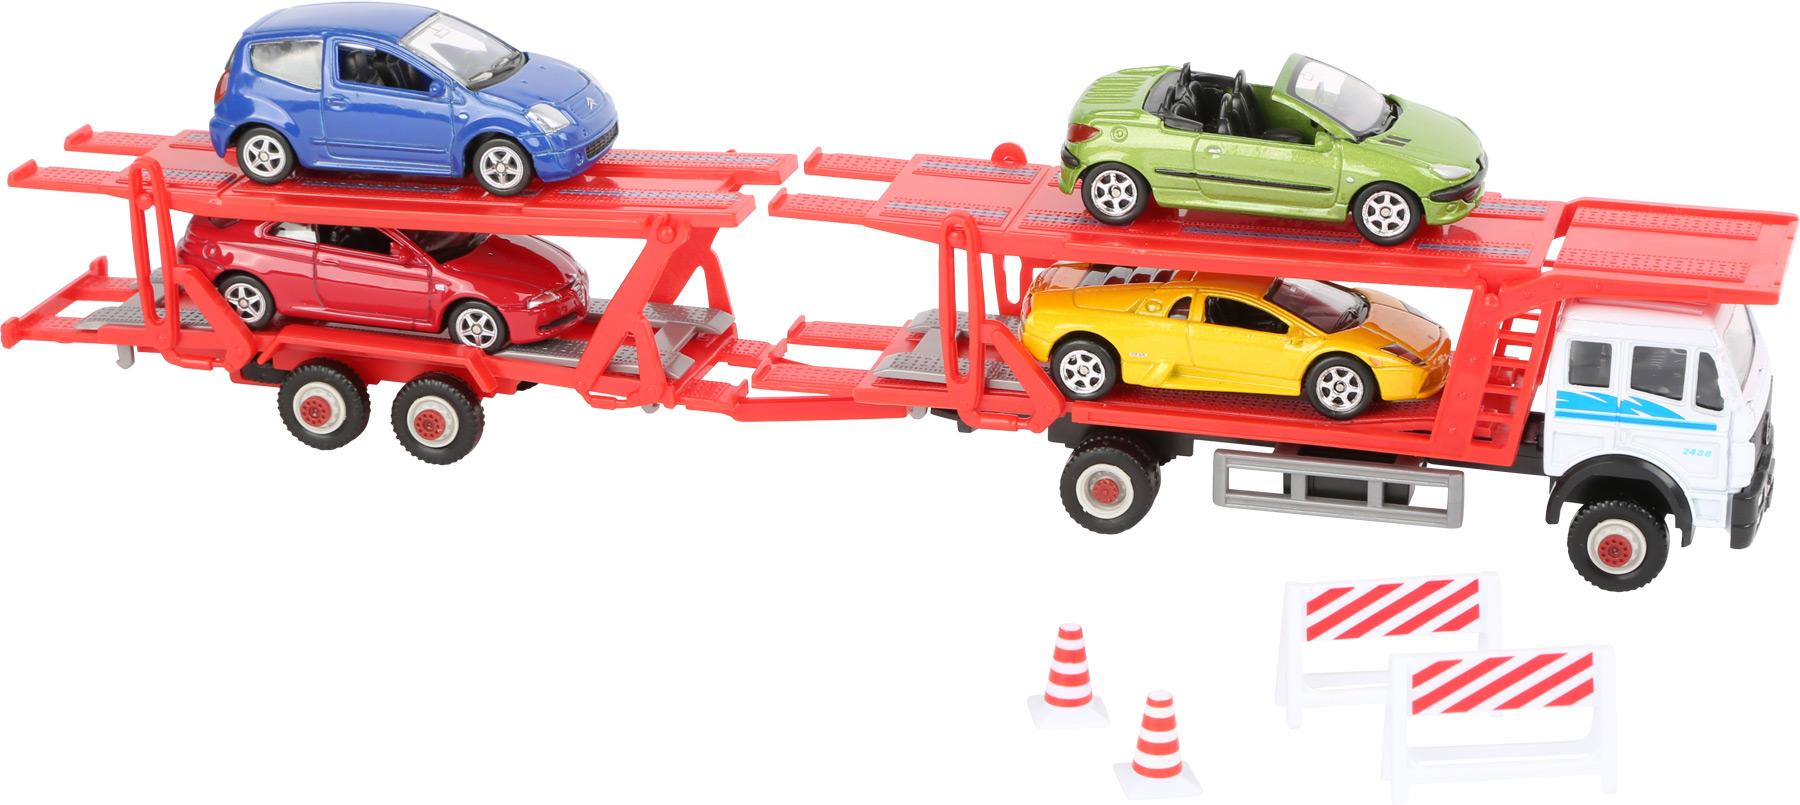 Small Foot Kamión s modelmi áut